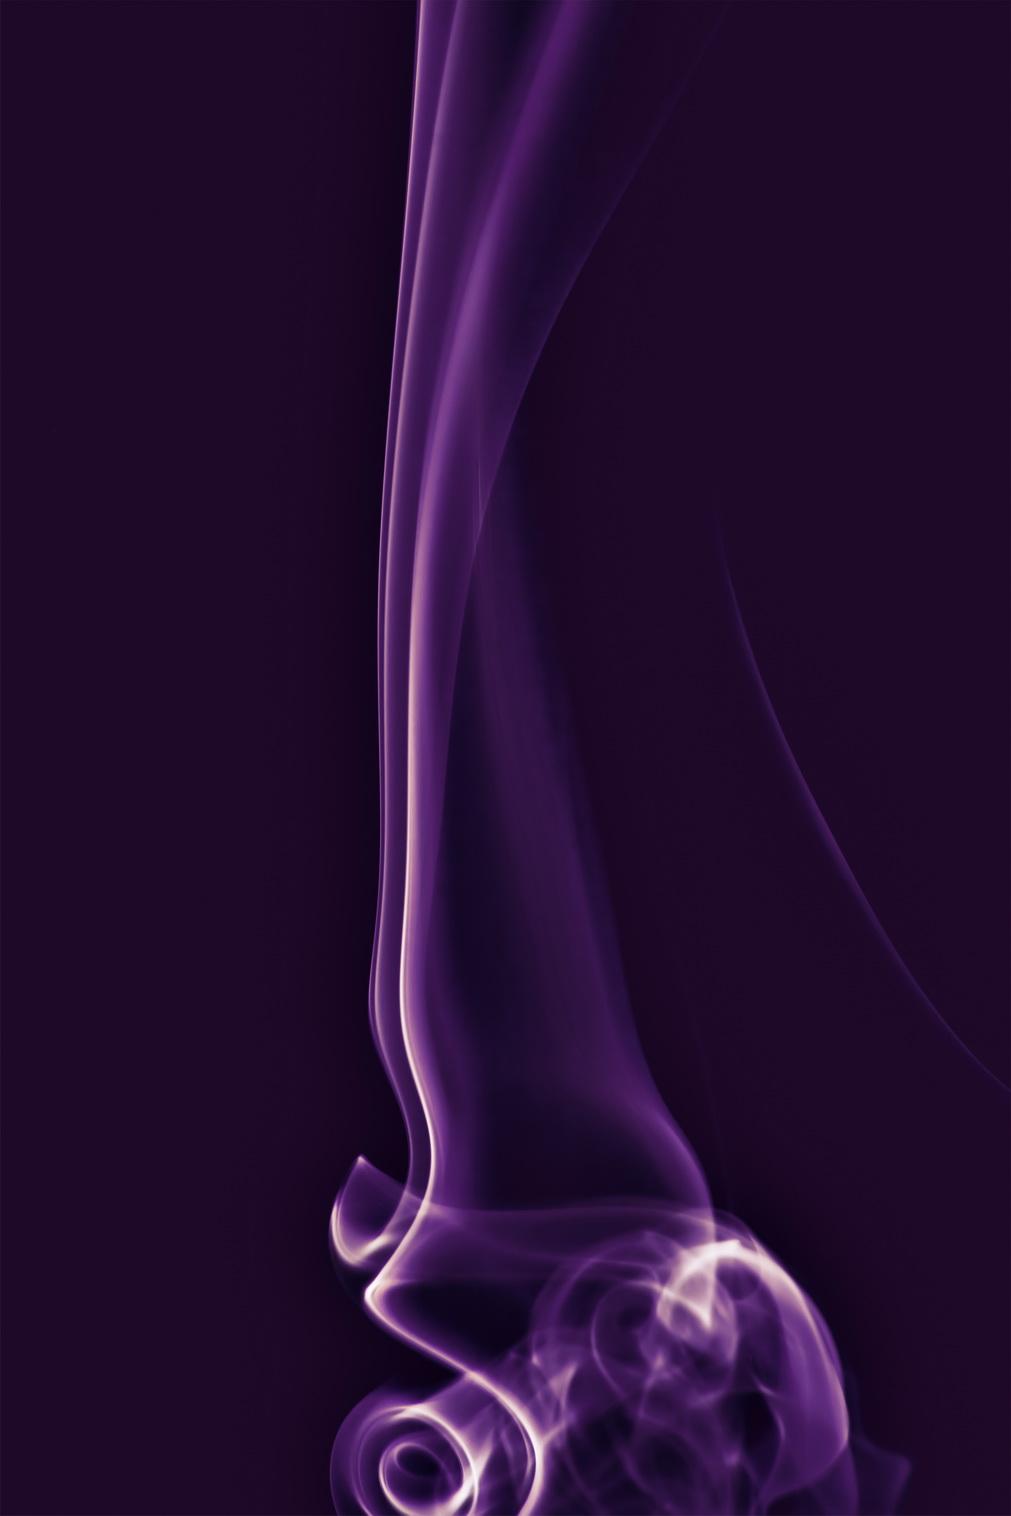 Purple smoke, Abstract, Smoke, Magic, Magical, HQ Photo